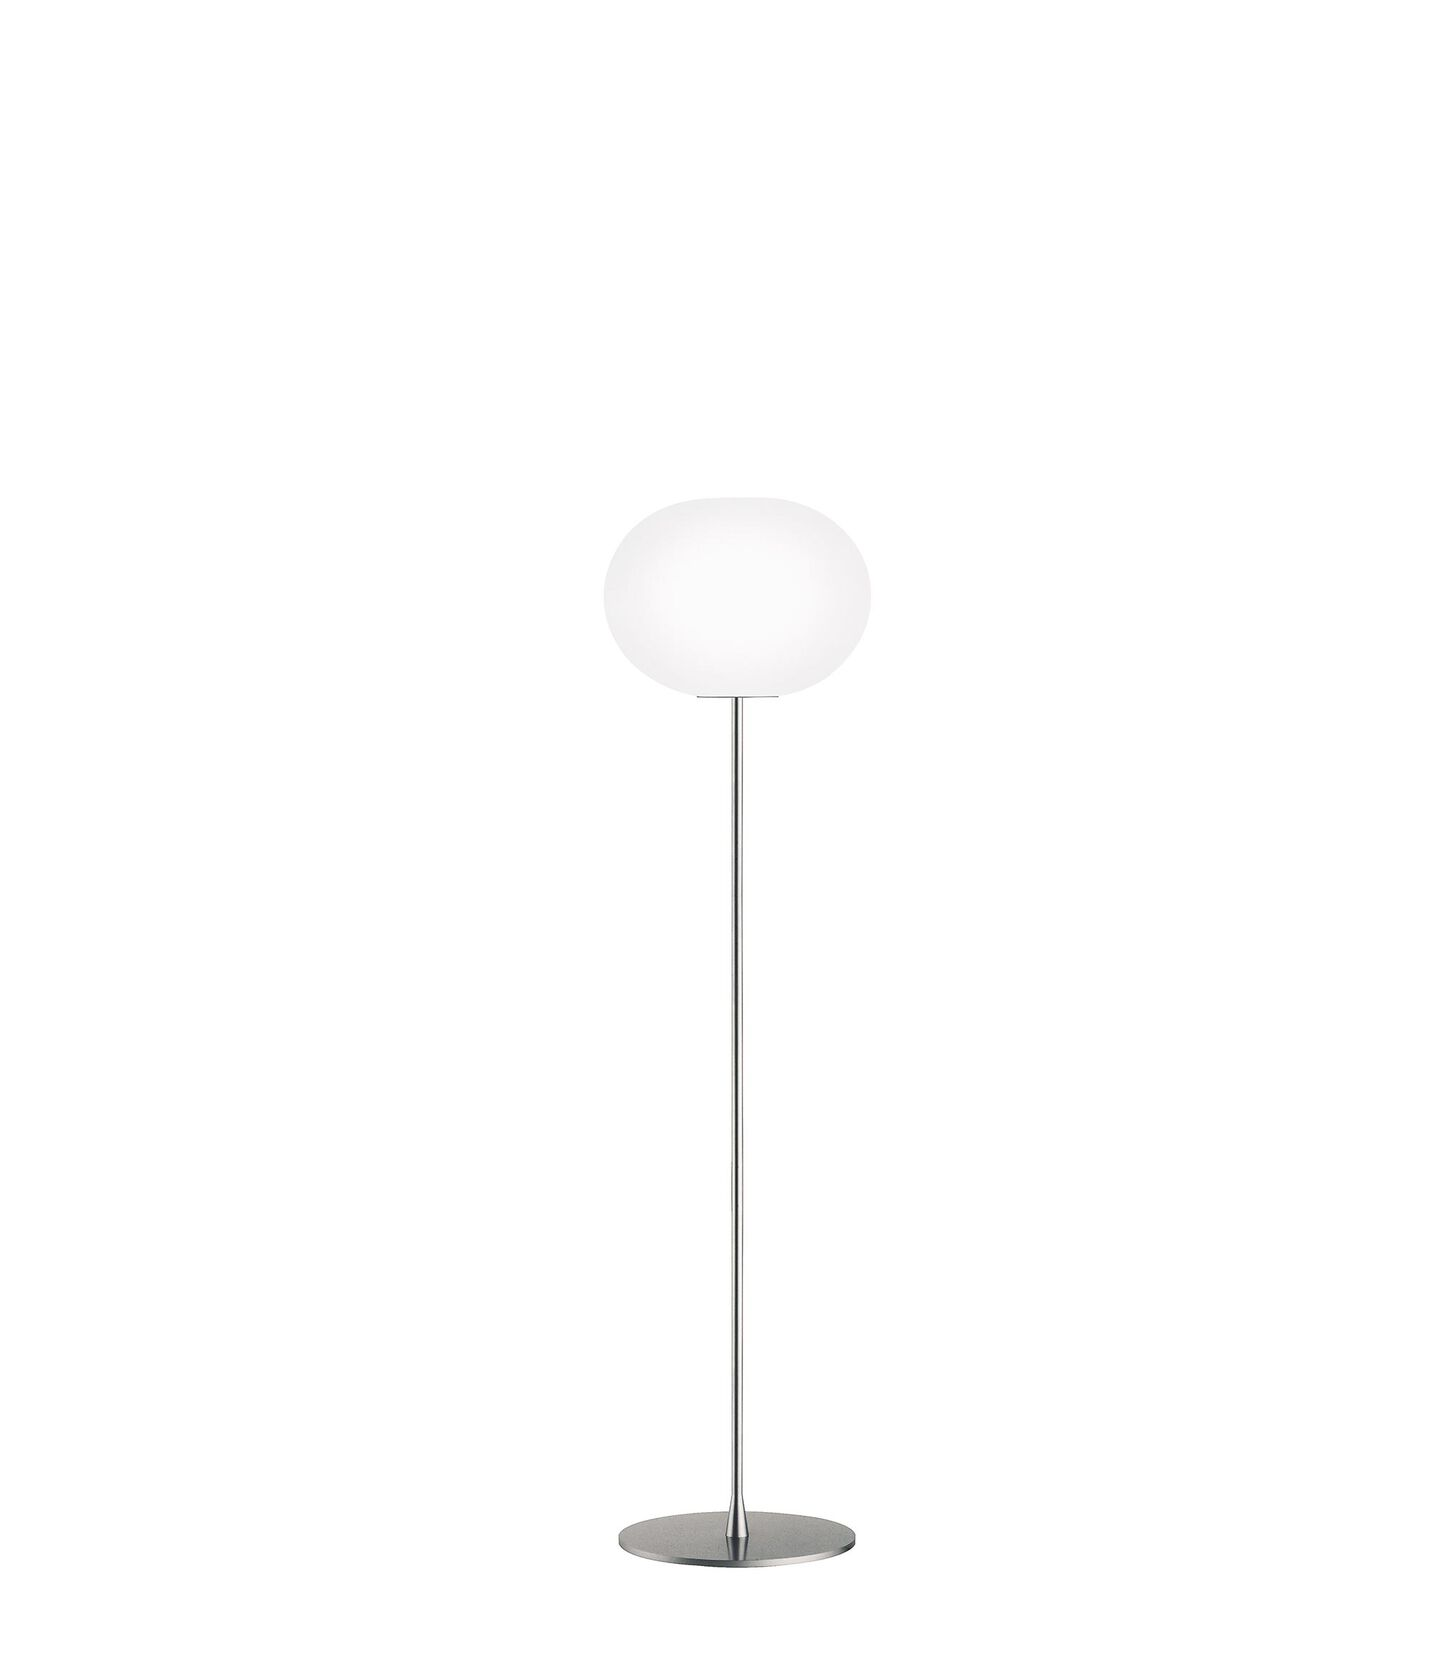 glo-ball-floor-2-morrison-flos-F3030000-product-still-life-big